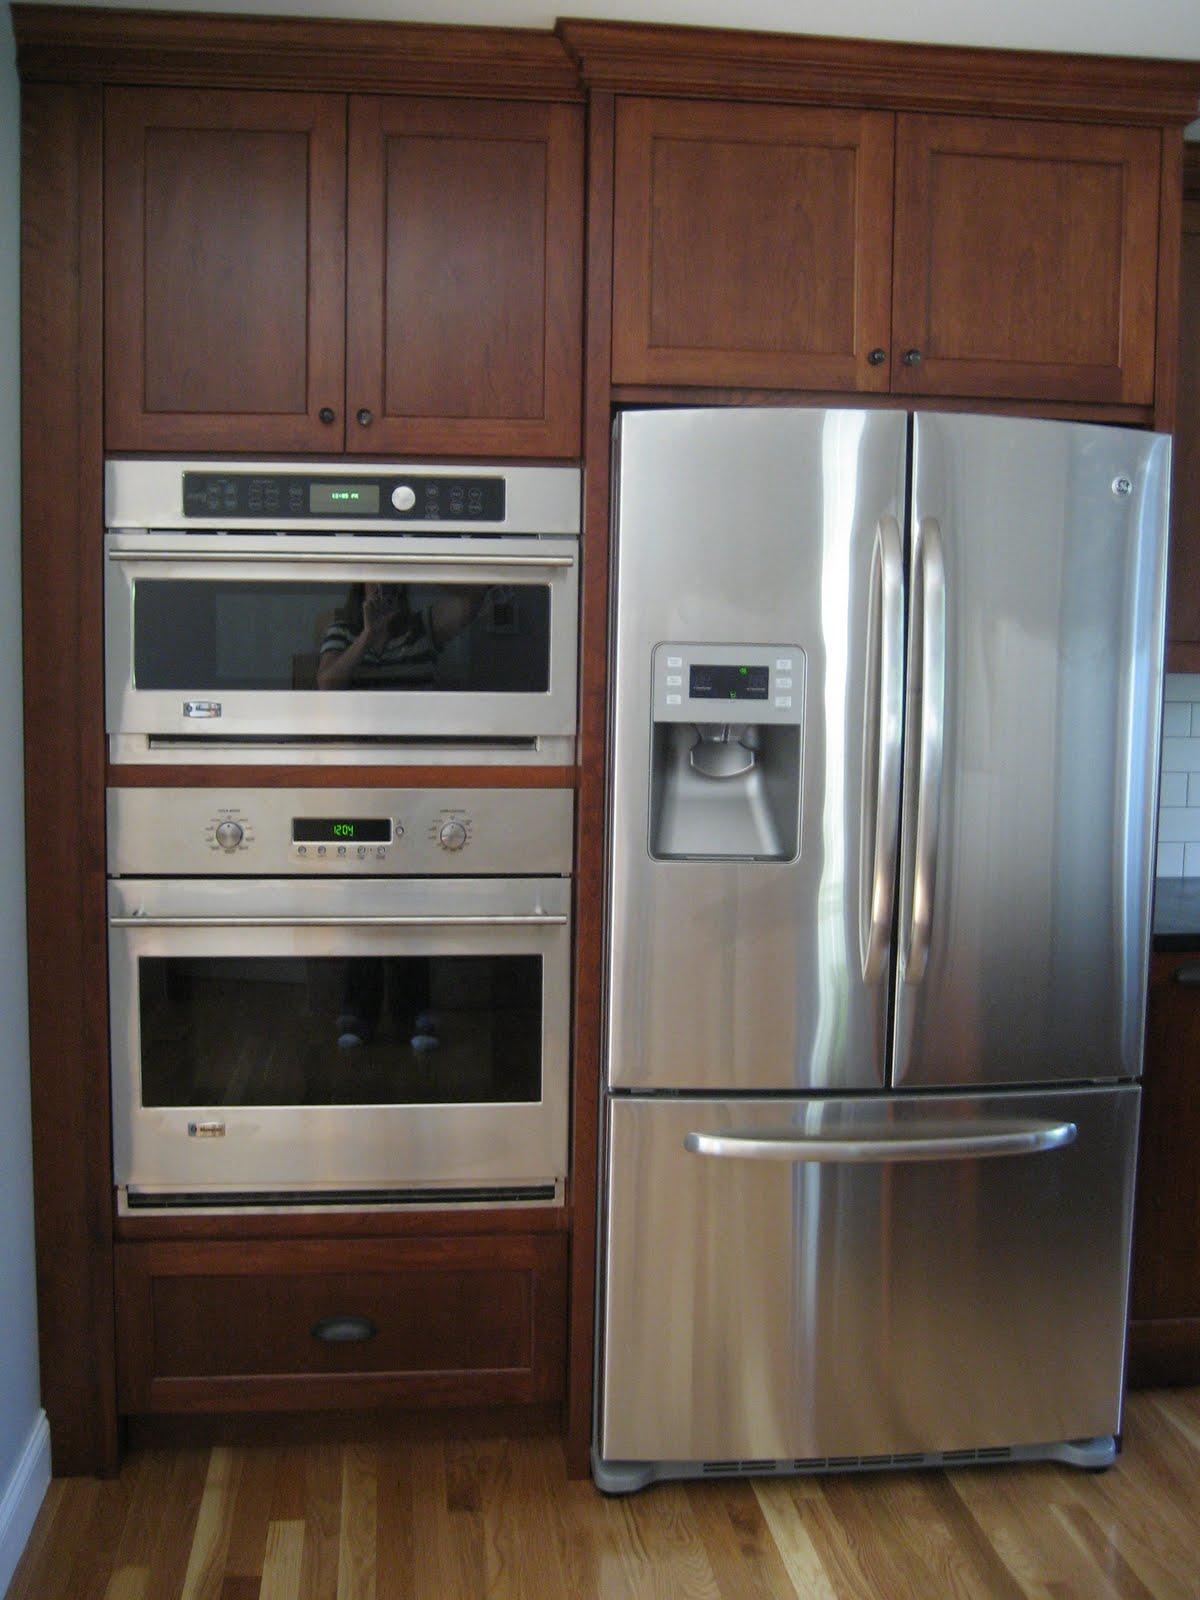 Fridge Oven Placement Idea Nokomis Kitchen Pinterest